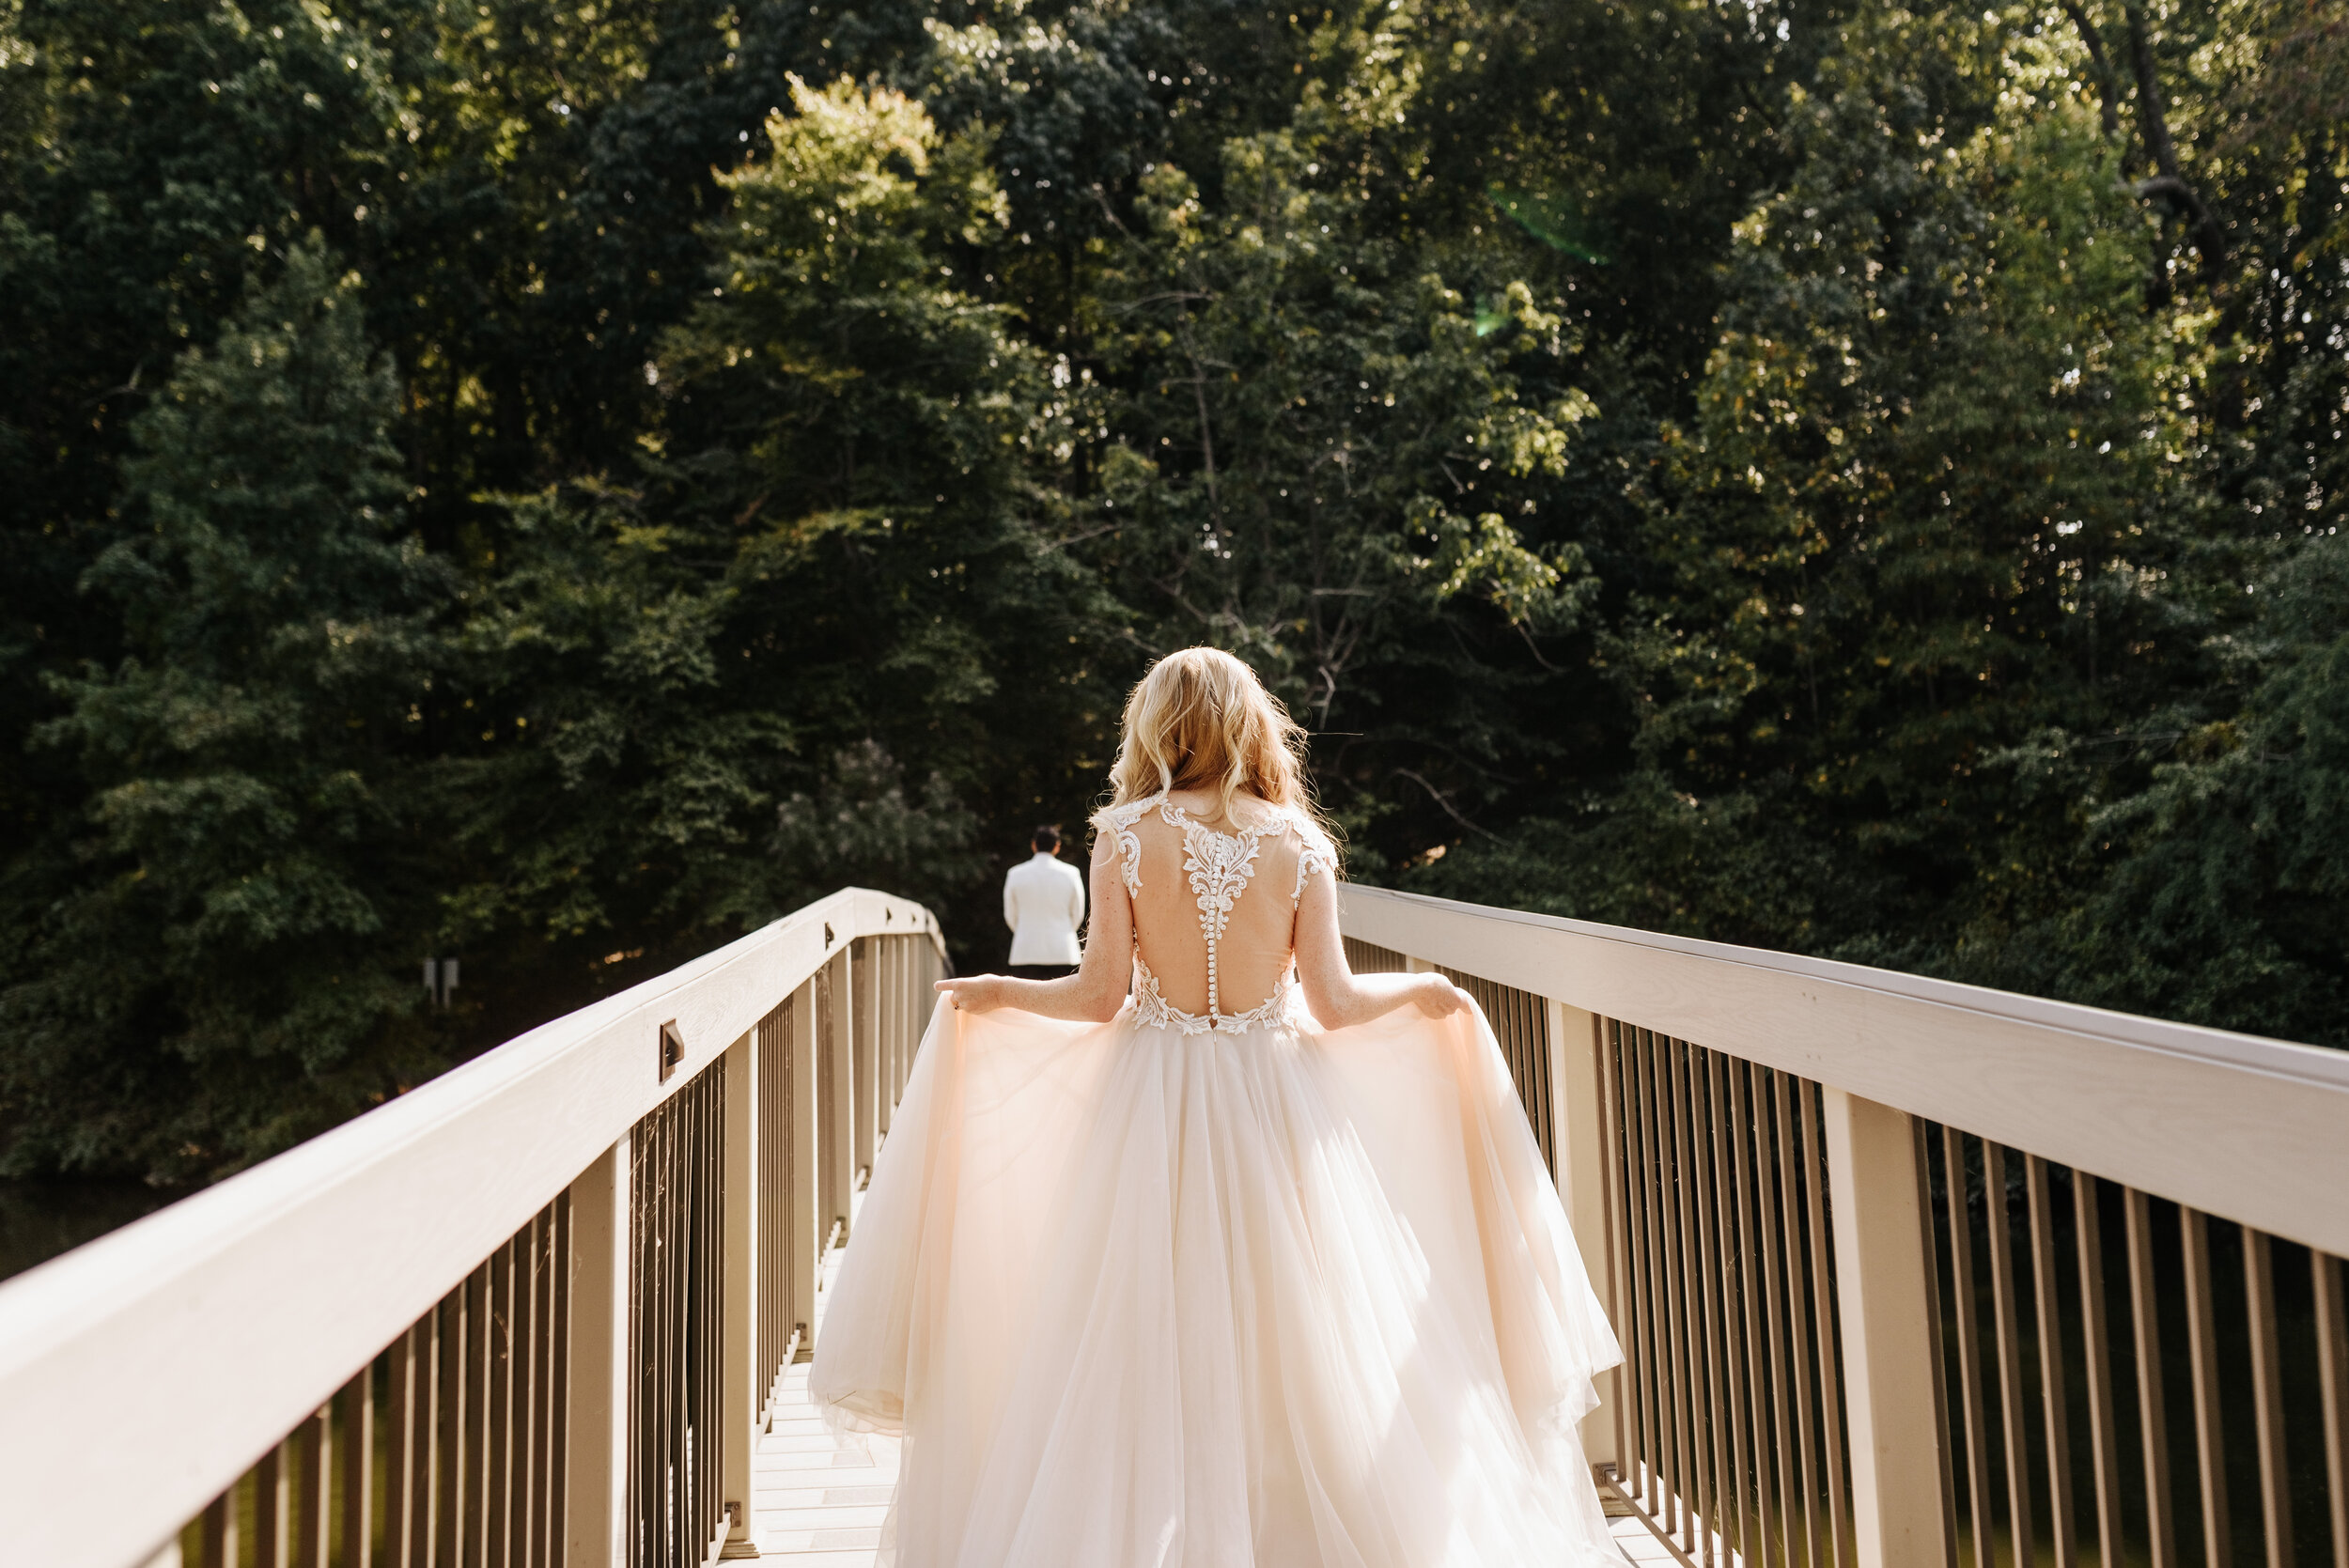 Cassie-Mrunal-Wedding-Quirk-Hotel-John-Marshall-Ballrooms-Richmond-Virginia-Photography-by-V-37.jpg